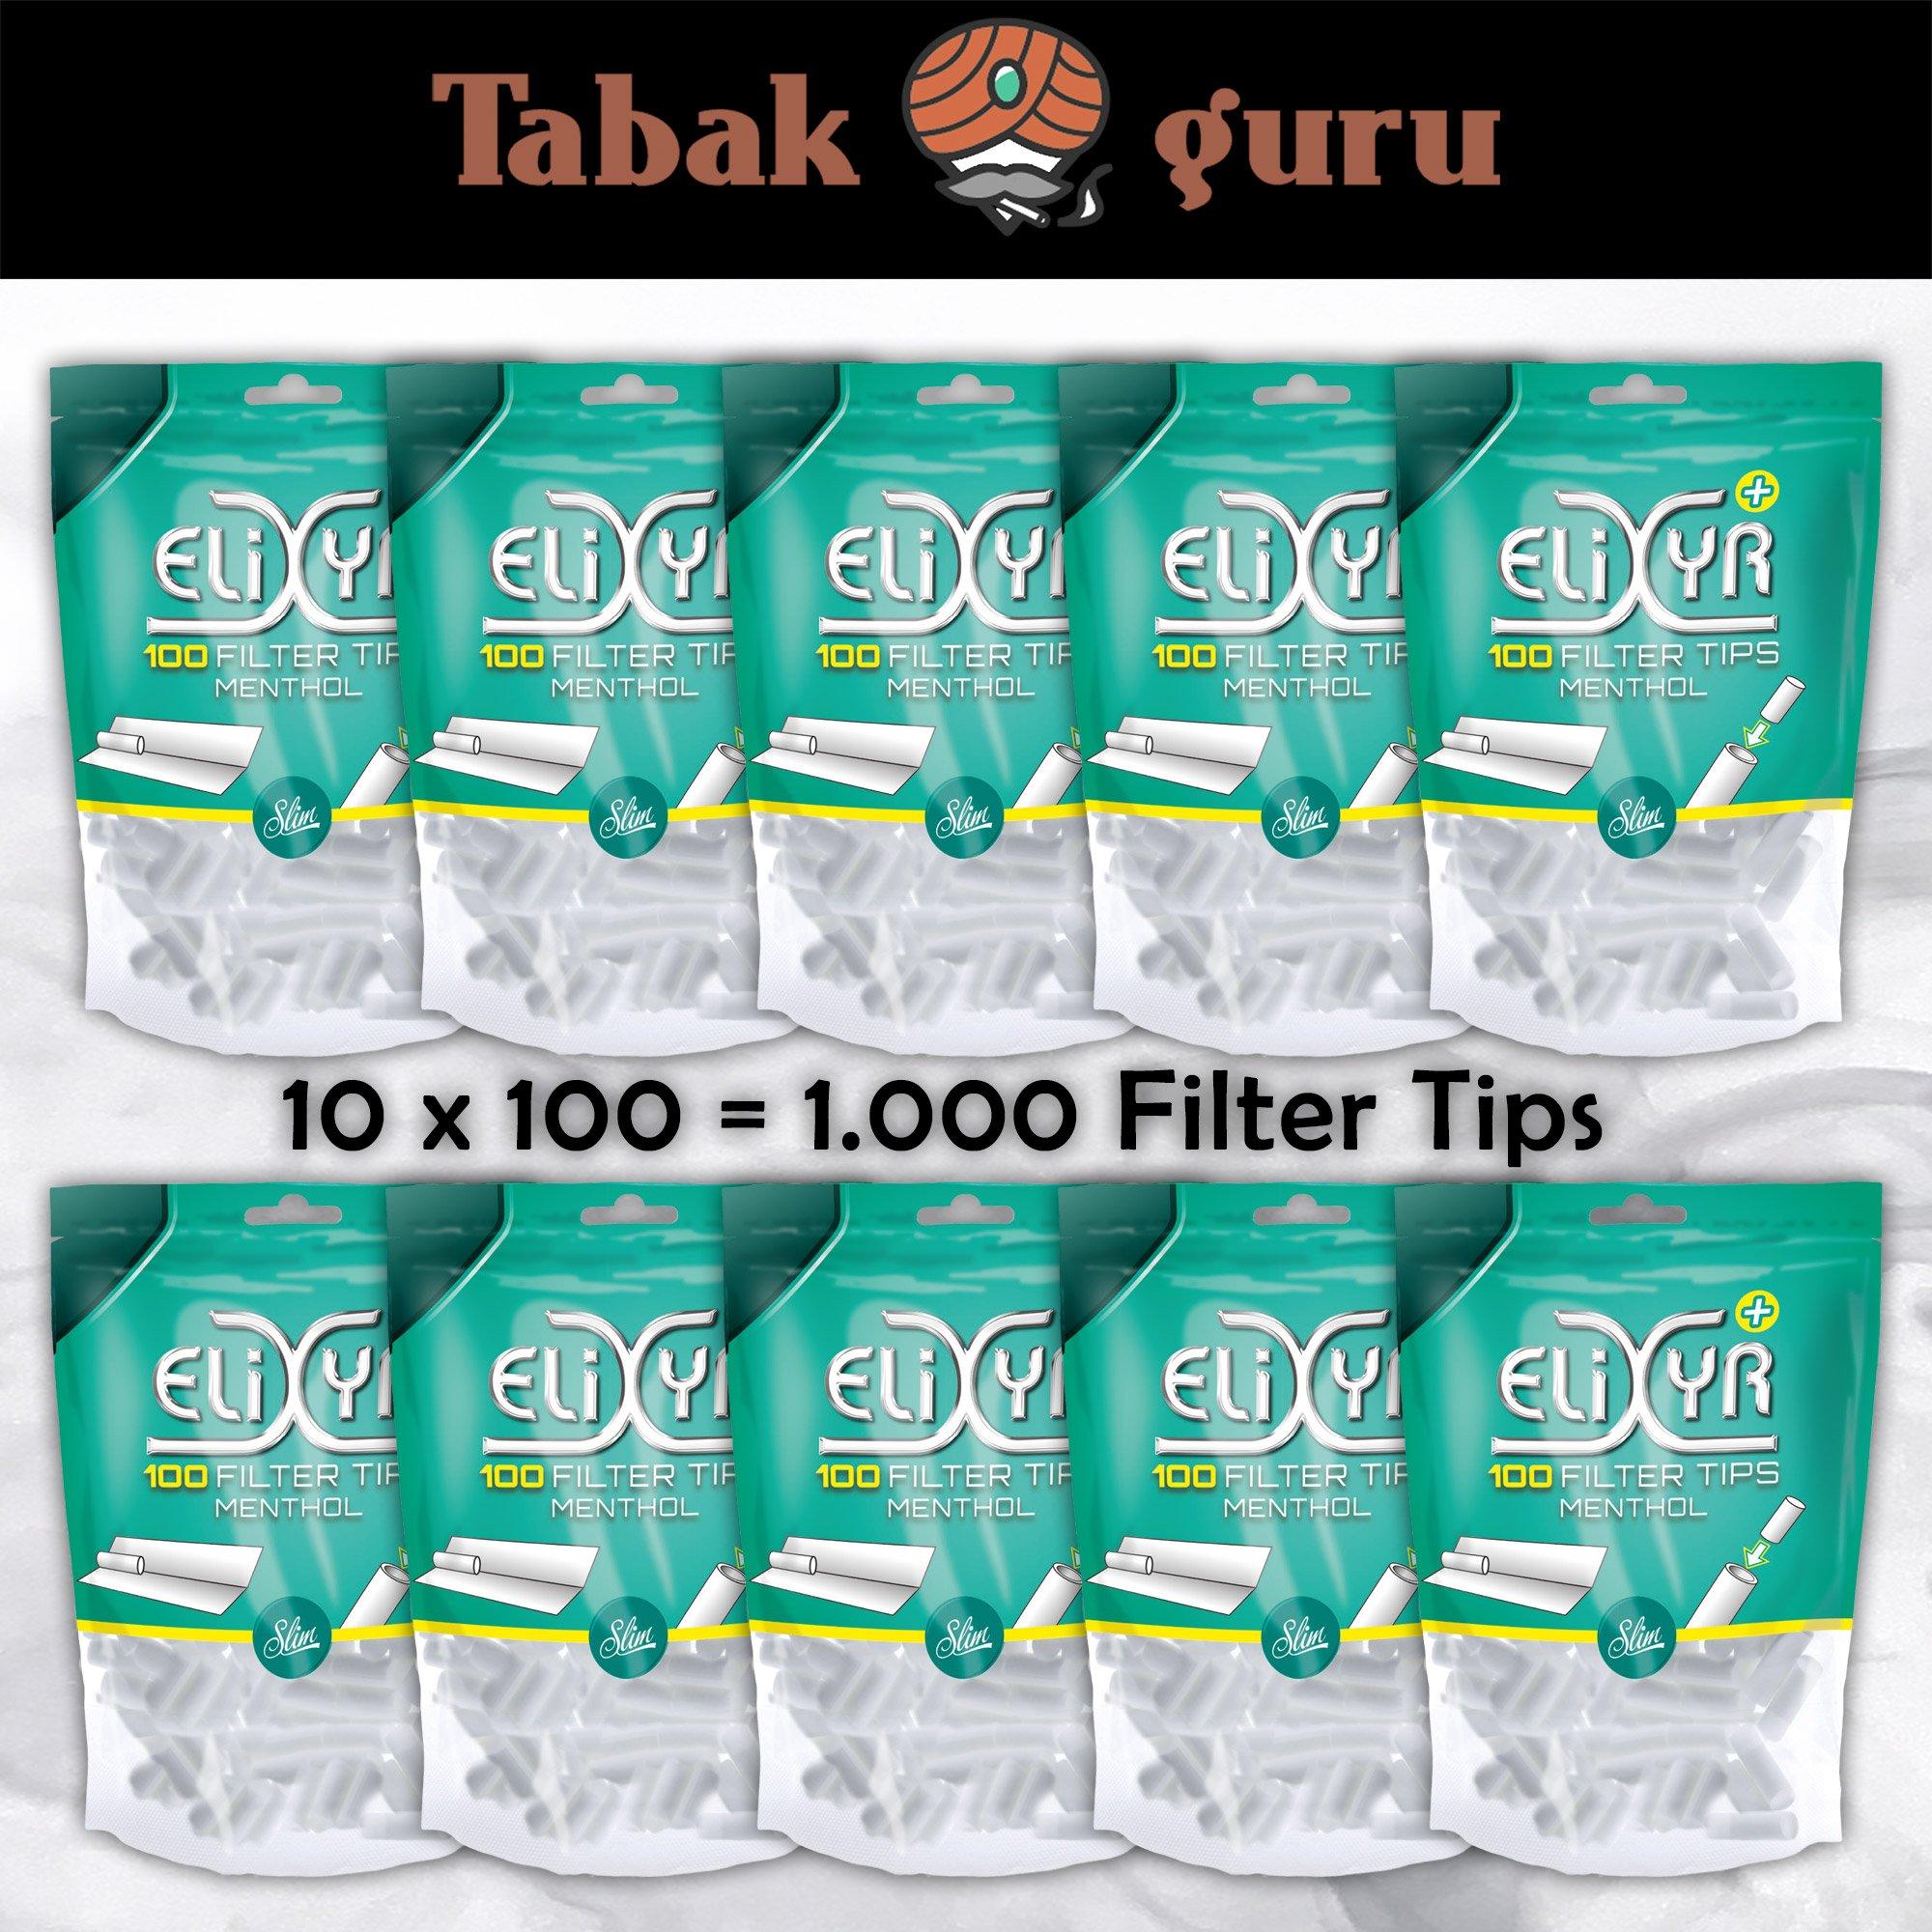 10x Elixyr Plus Slim Filter Tips Menthol, 6 mm, à 100 Feinfilter